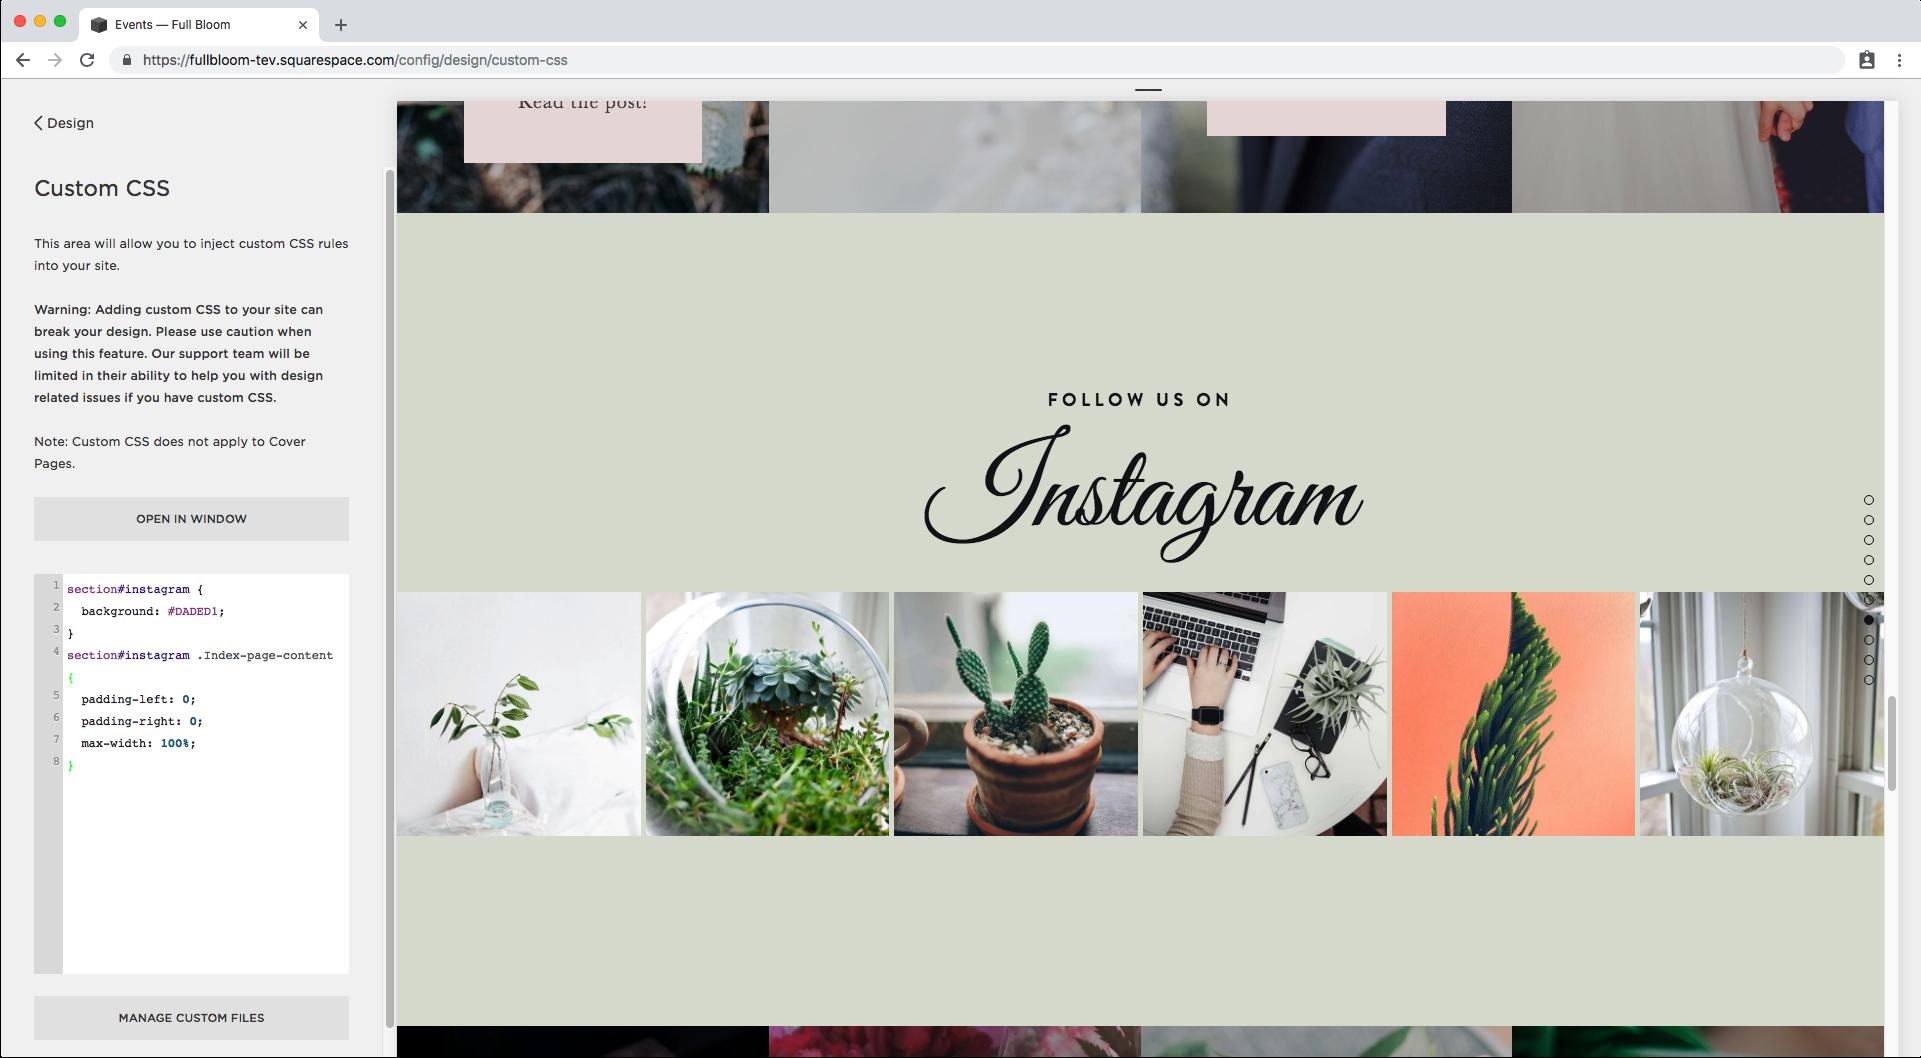 9. Making Instagram block full width in Brine index.png